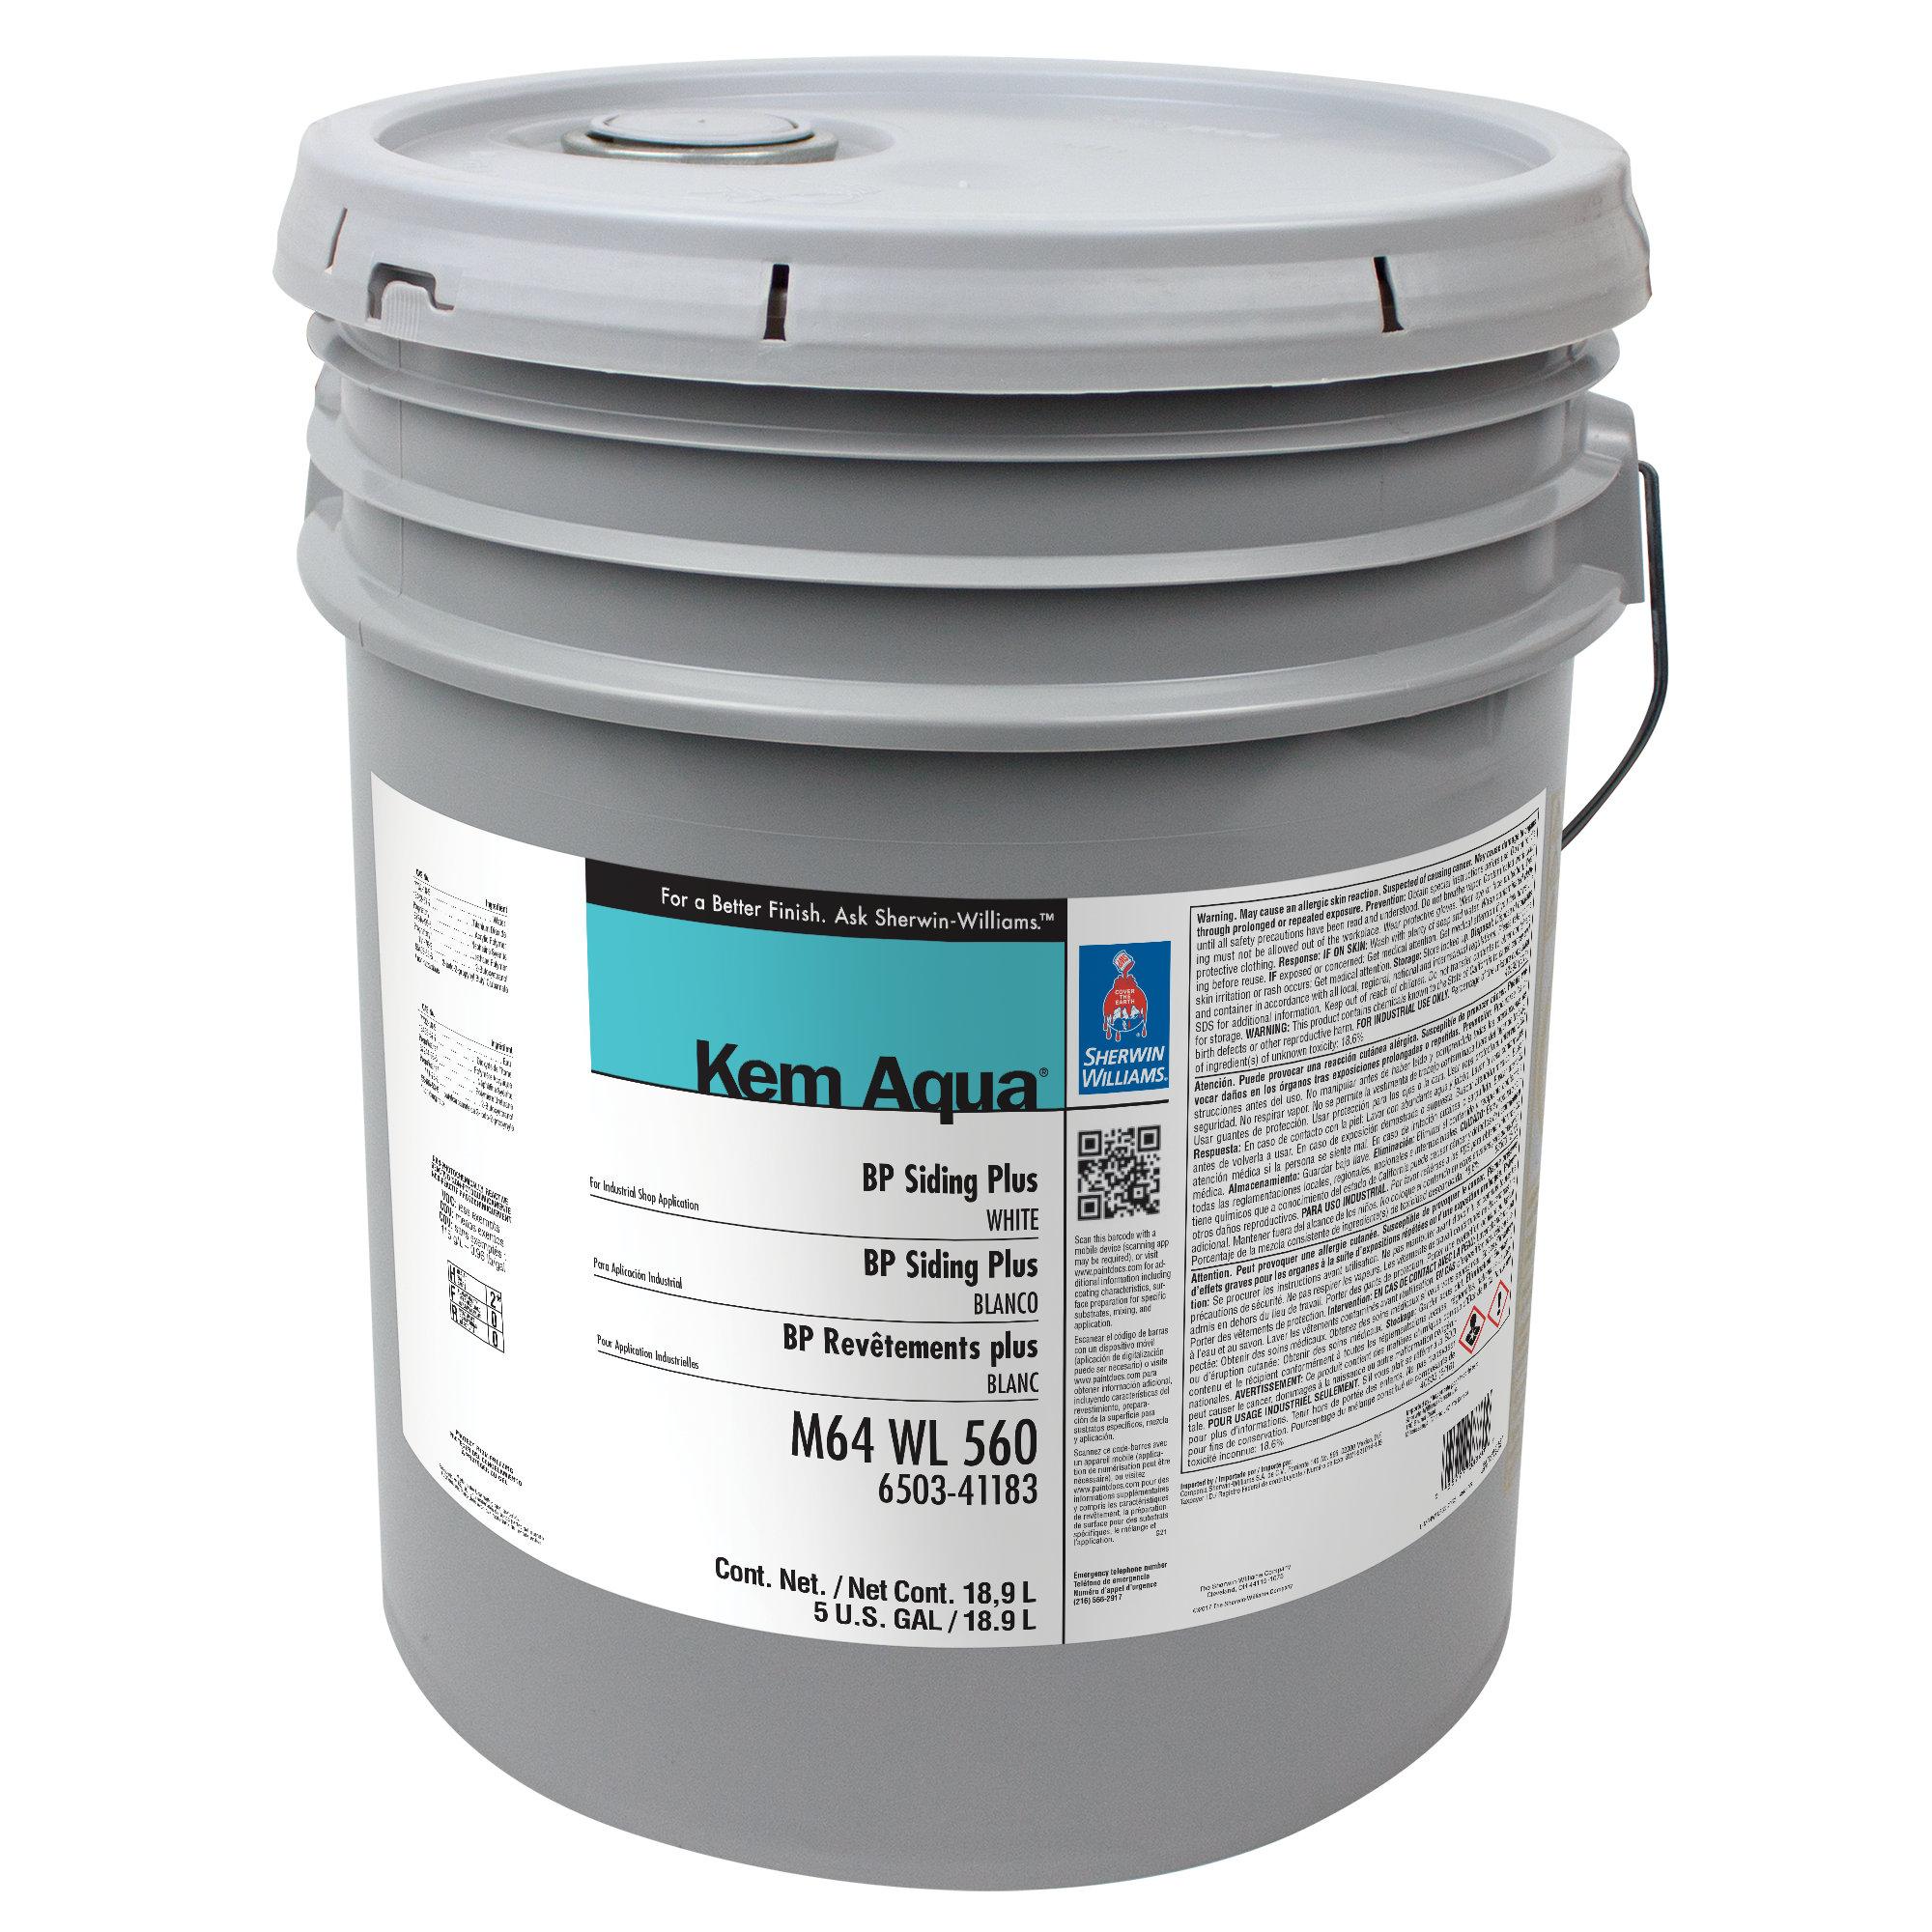 KEM Aqua BP Siding Plus